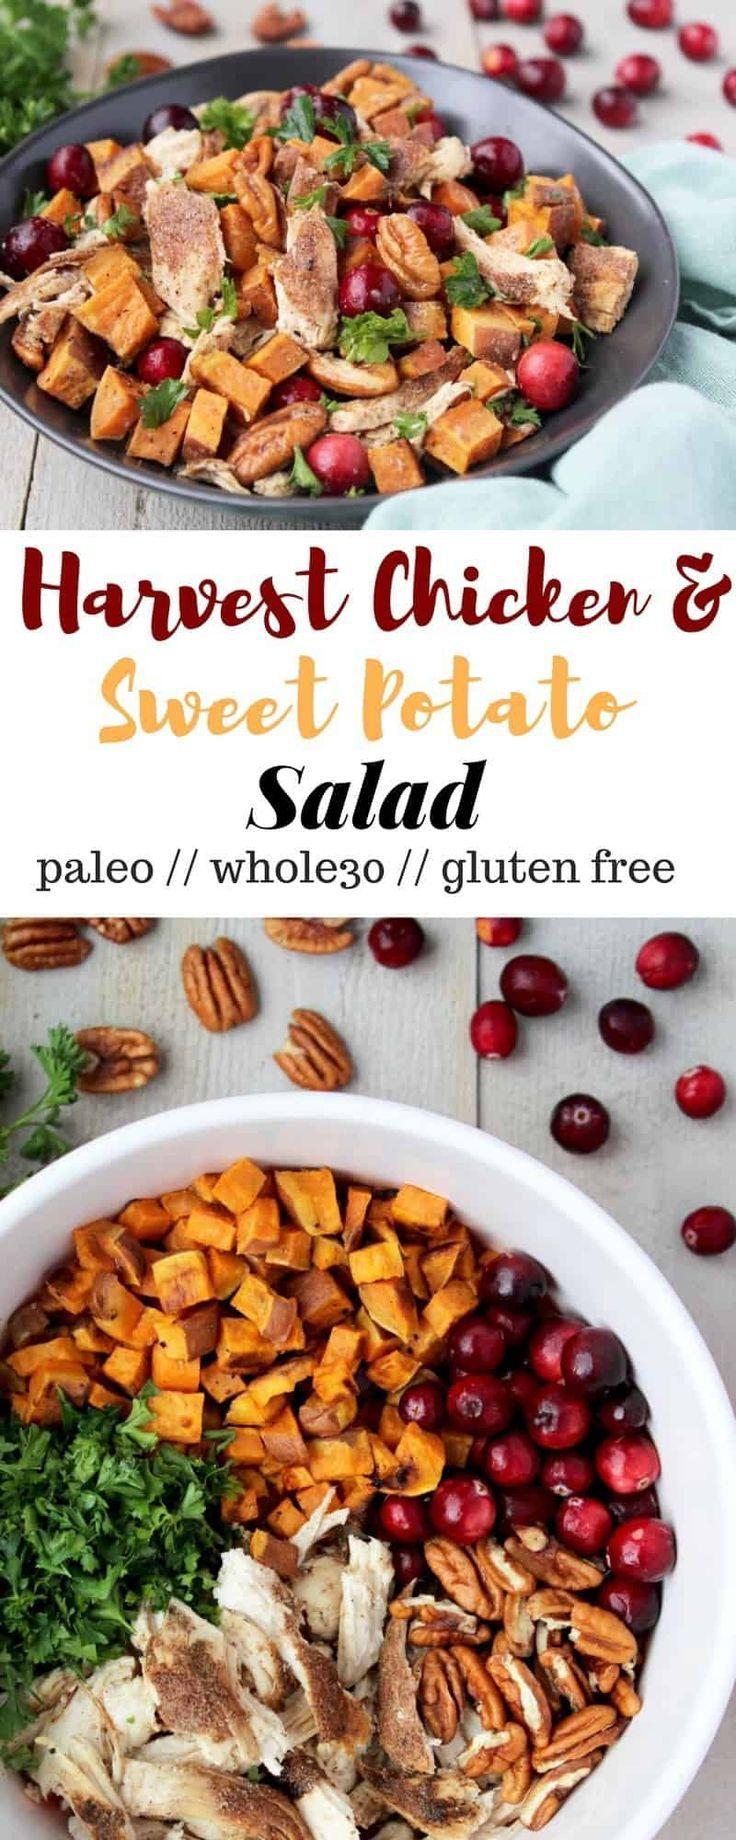 Harvest Chicken & Sweet Potato Salad images